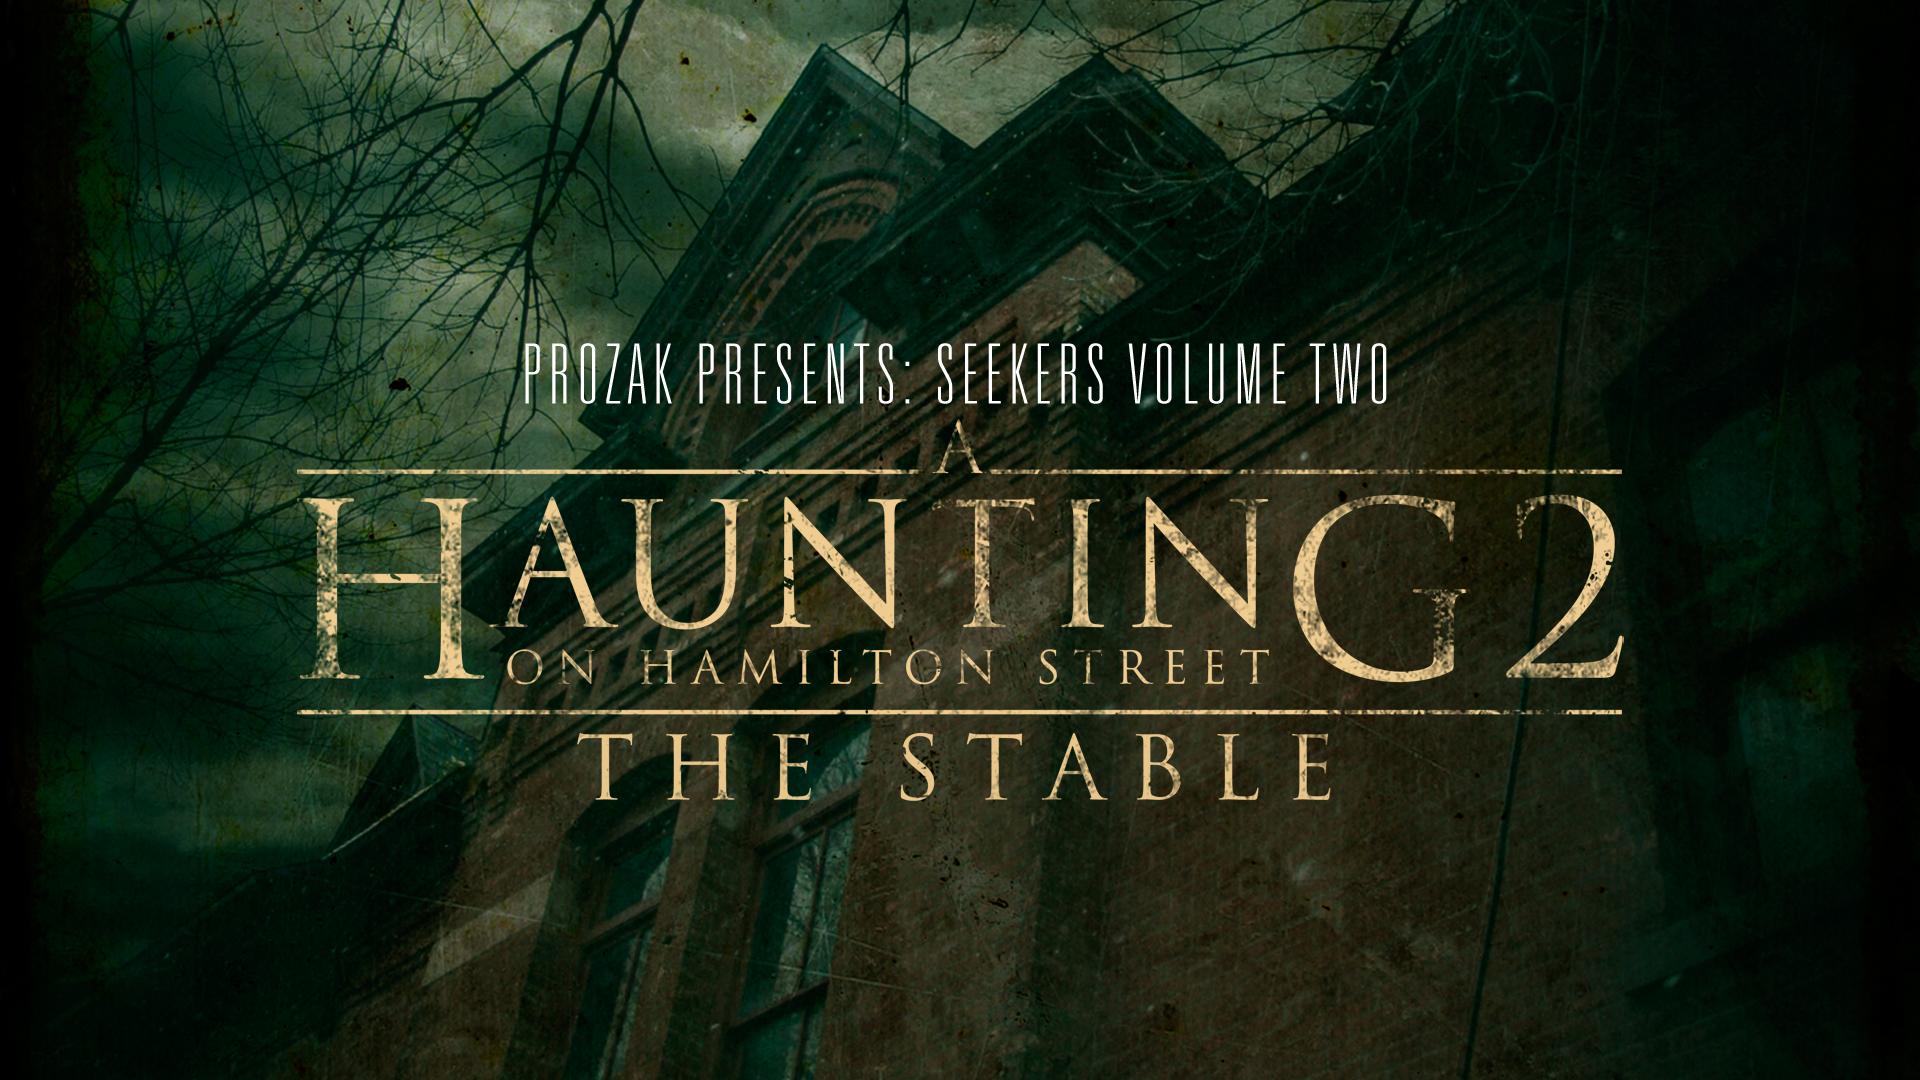 A Haunting on Hamilton Street 2